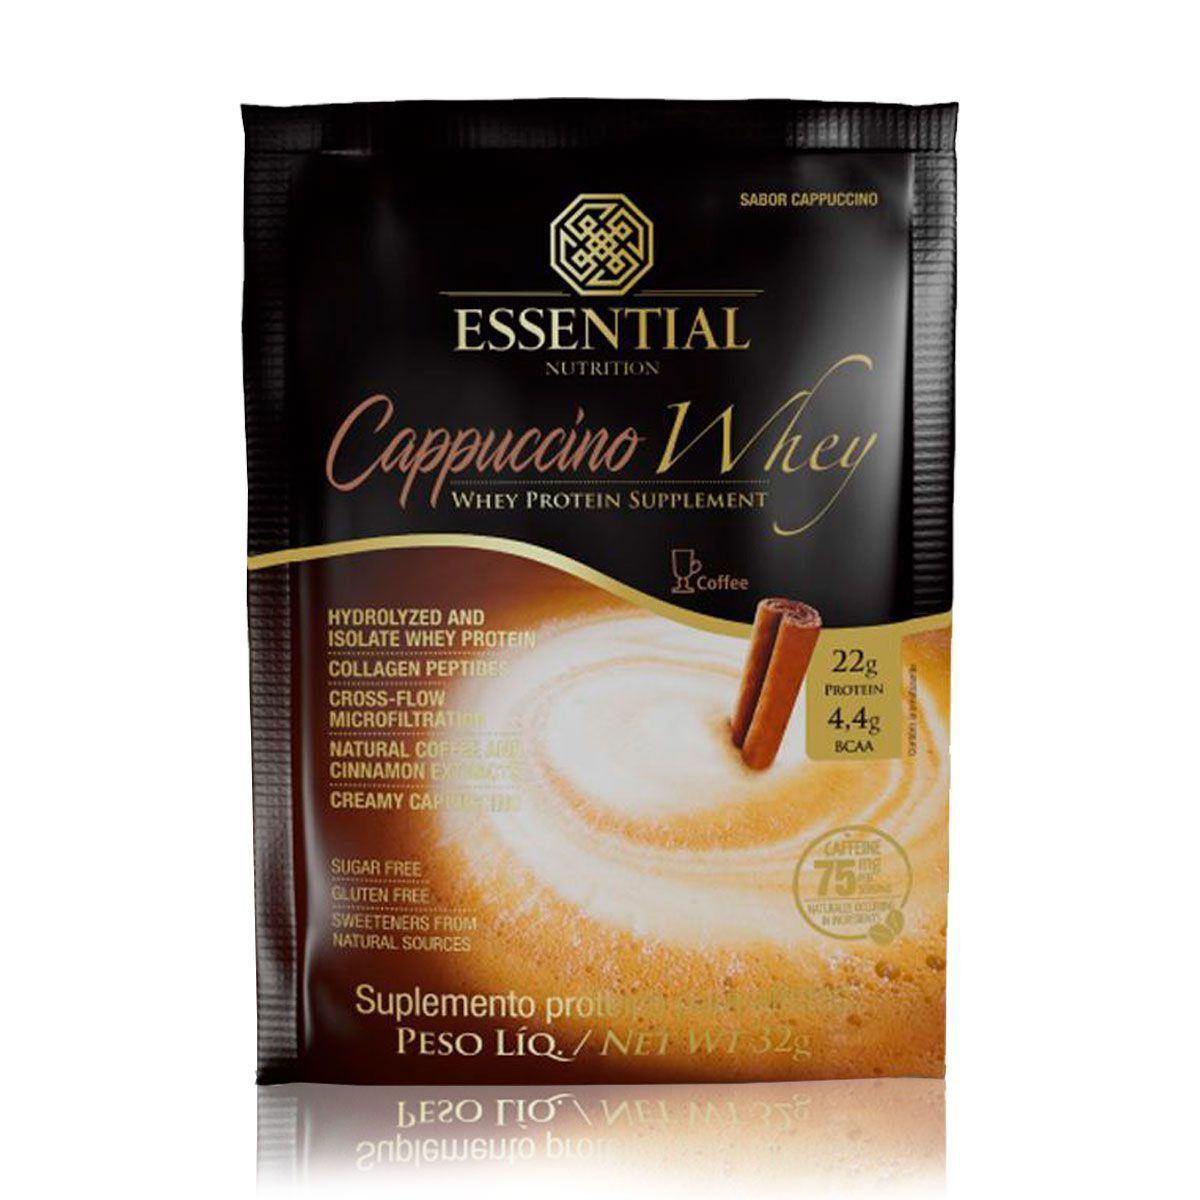 Cappuccino Whey Sachê Essential Nutrition